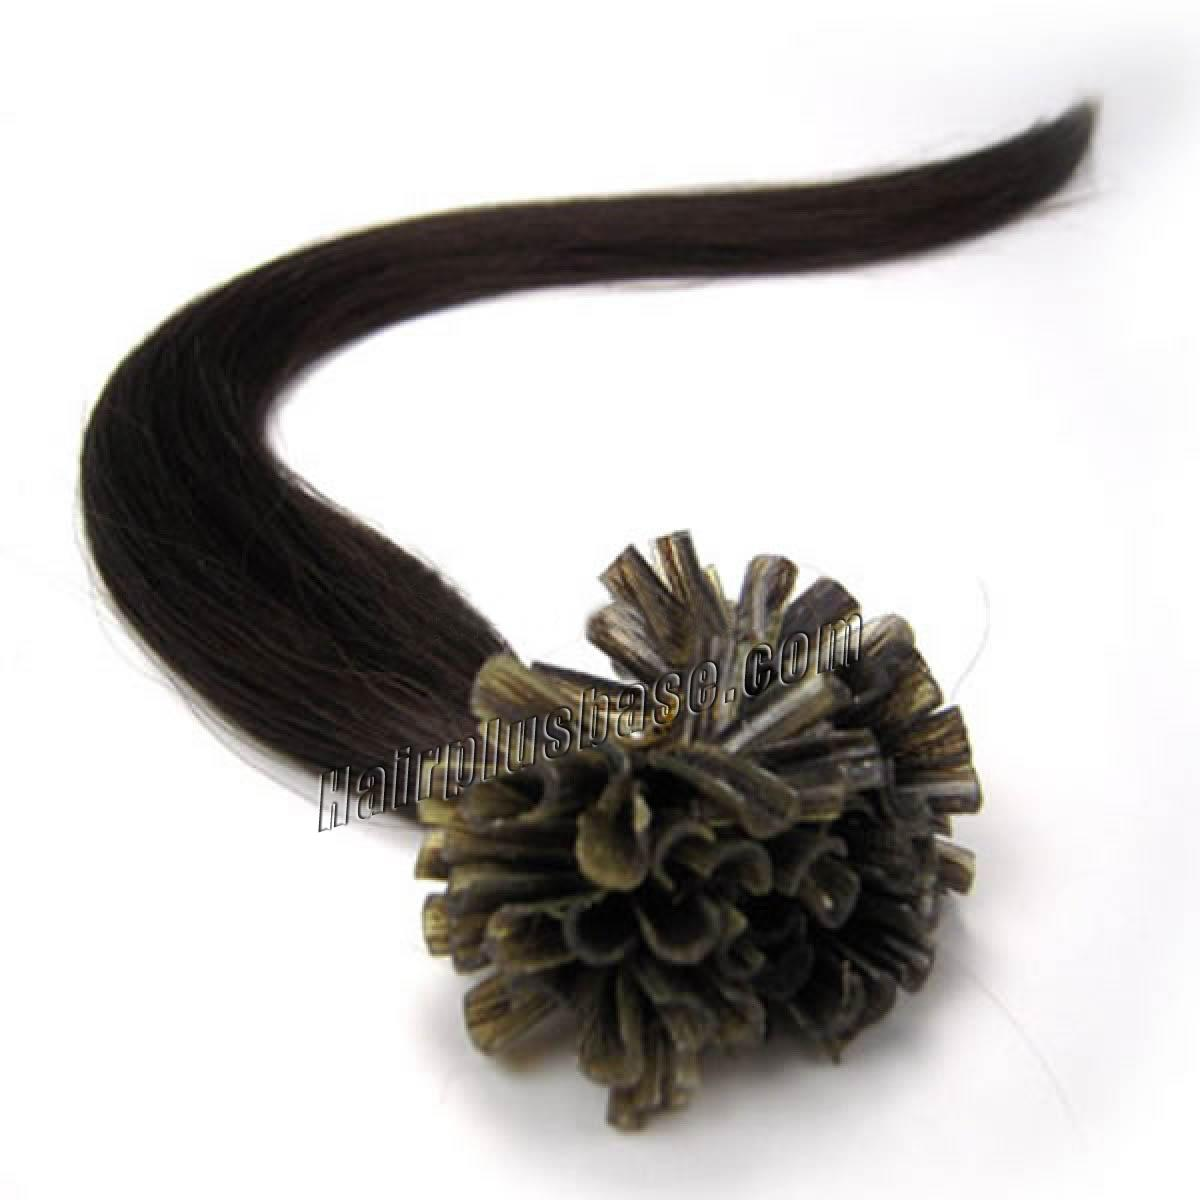 26 Inch 2 Dark Brown Nail Tip Human Hair Extensions 100s